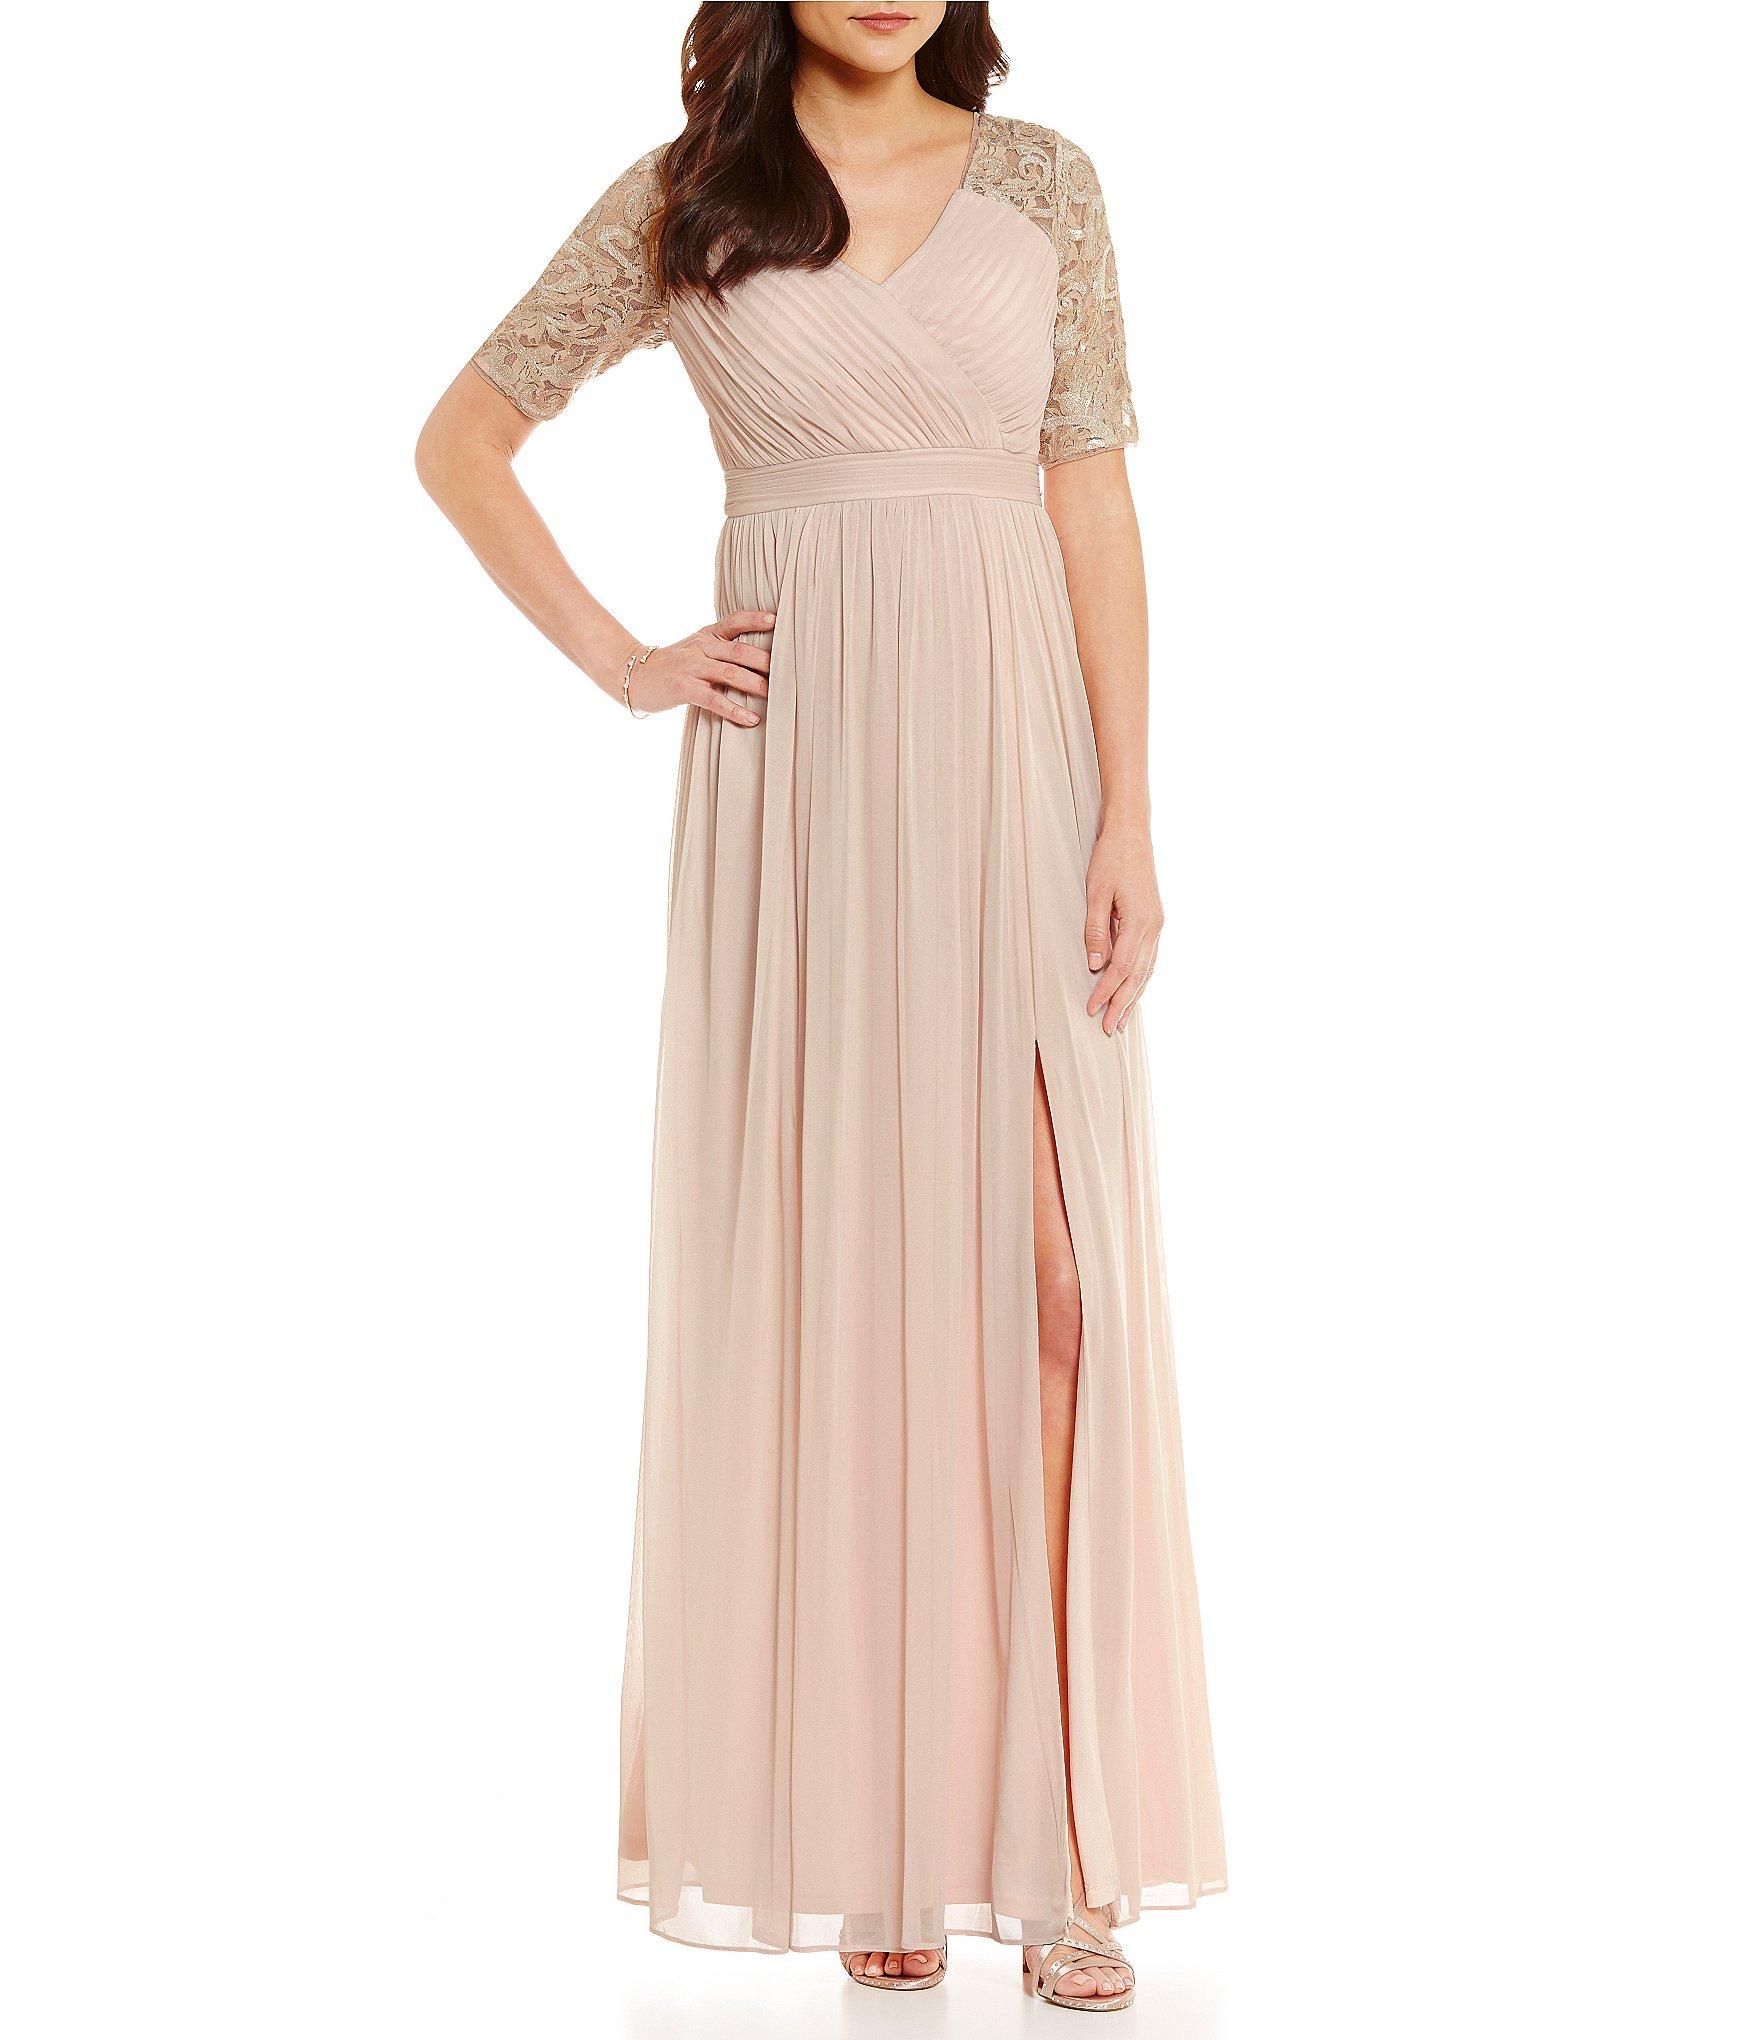 Adrianna Papell Women\'s Formal Dresses & Gowns   Dillards